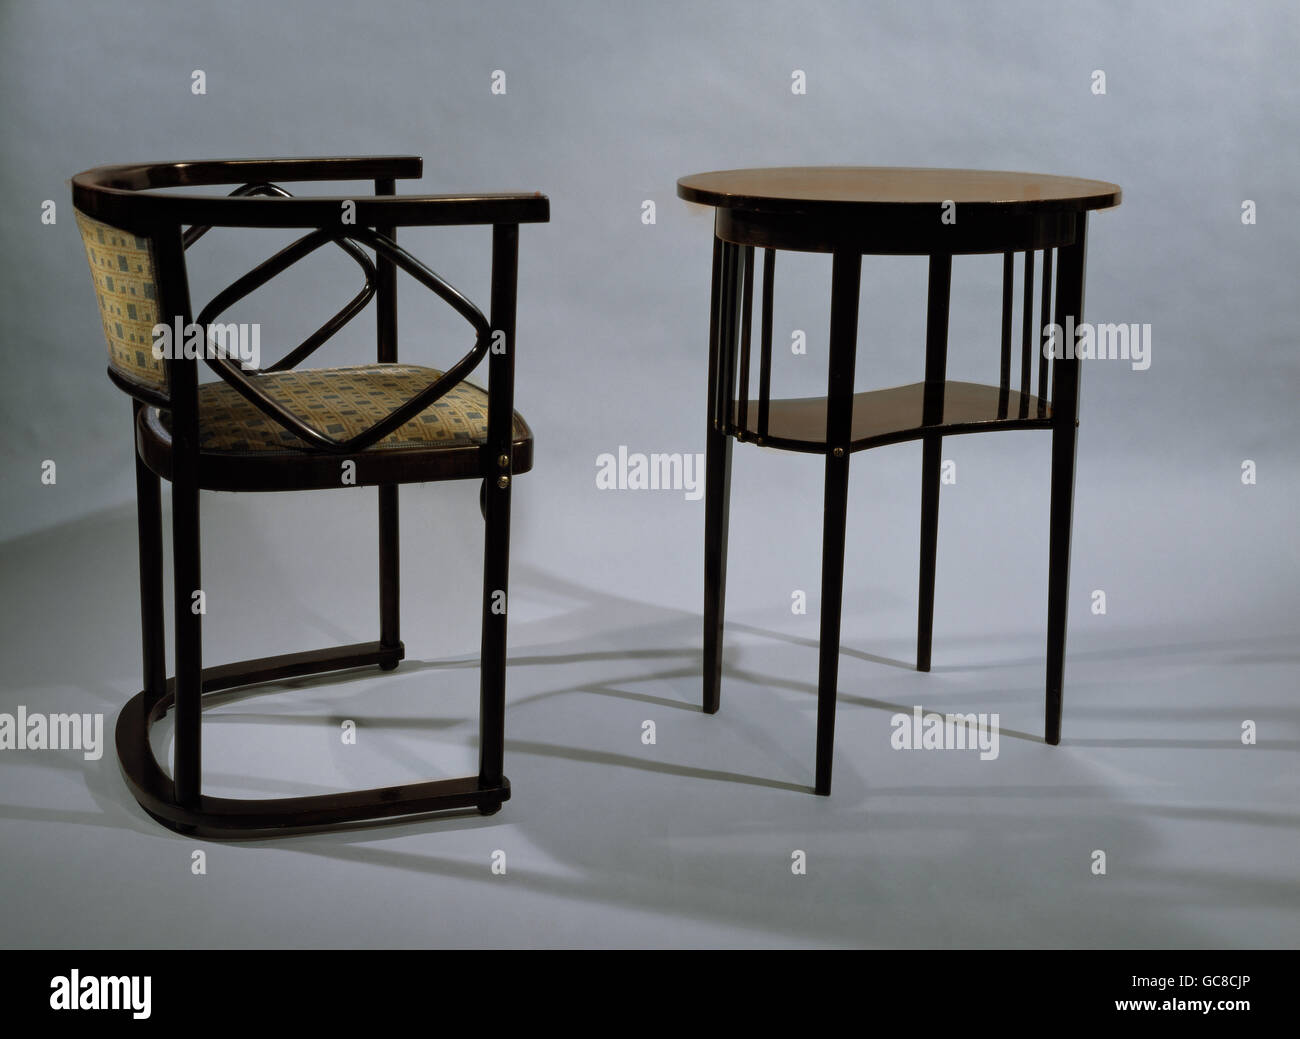 Einrichtung Möbel Jugendstil Stuhl Höhe 755 Cm Ovaler Tisch